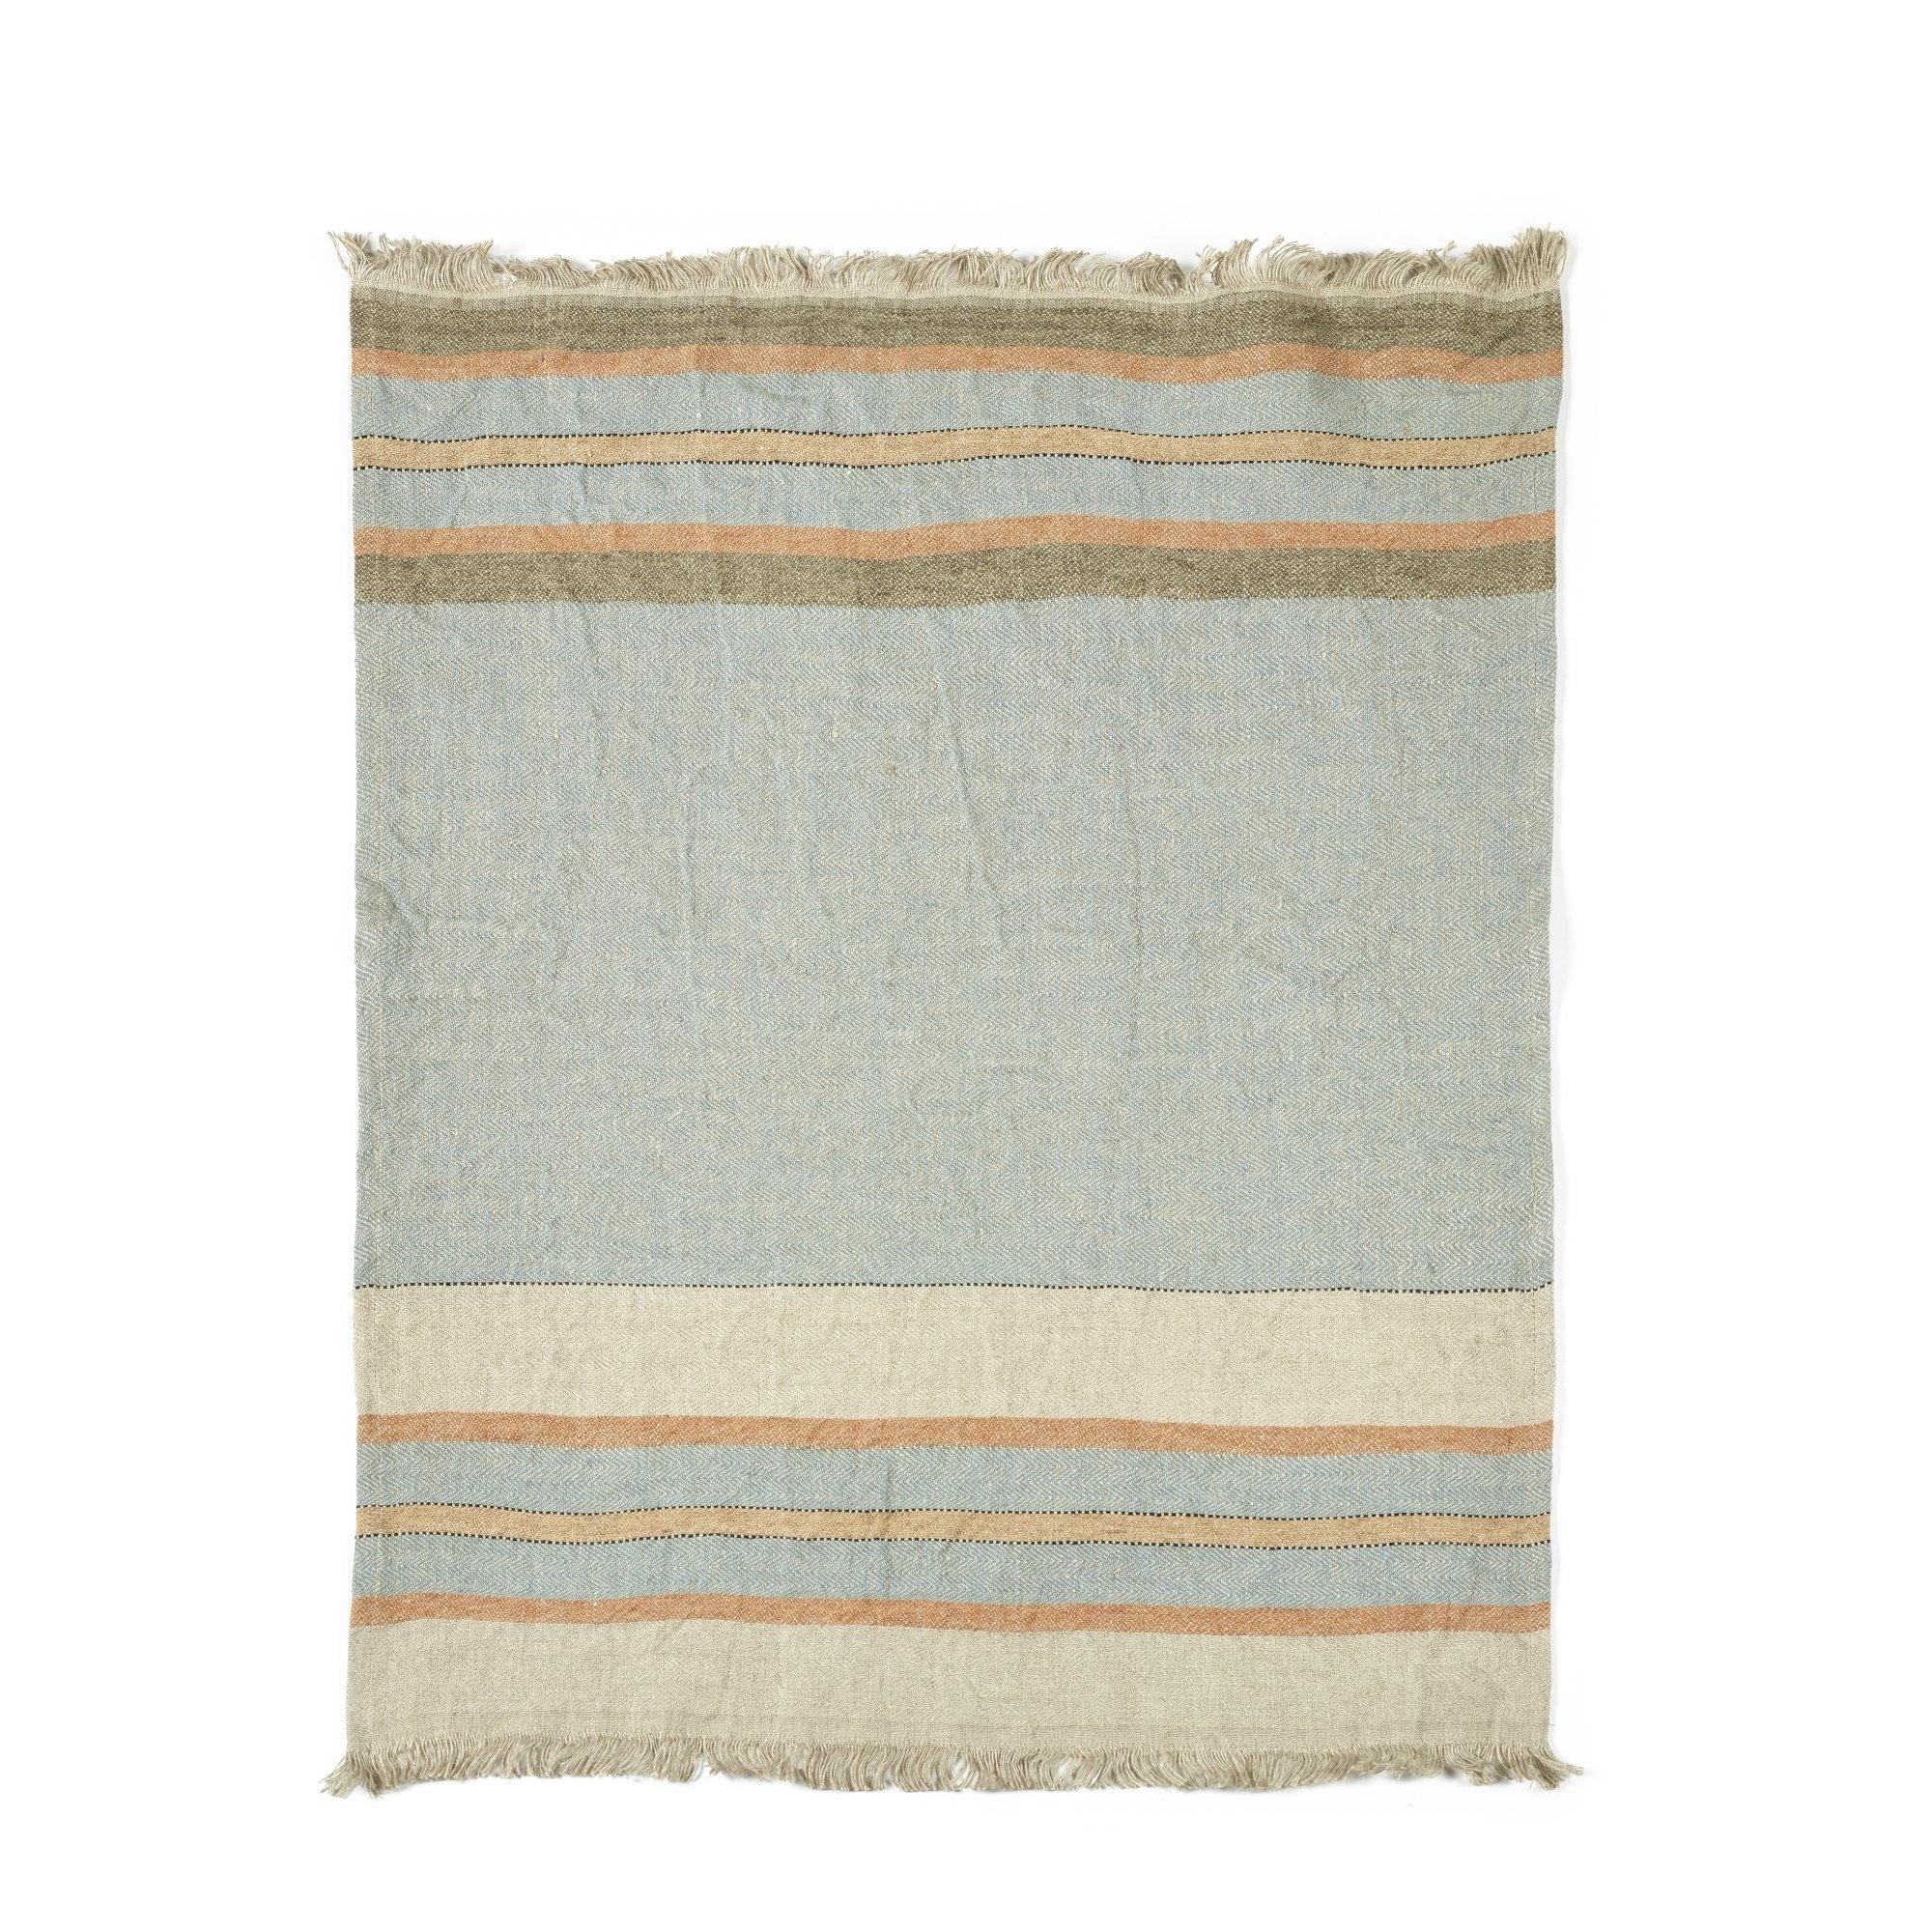 Libeco Belgian Fouta Towel-11